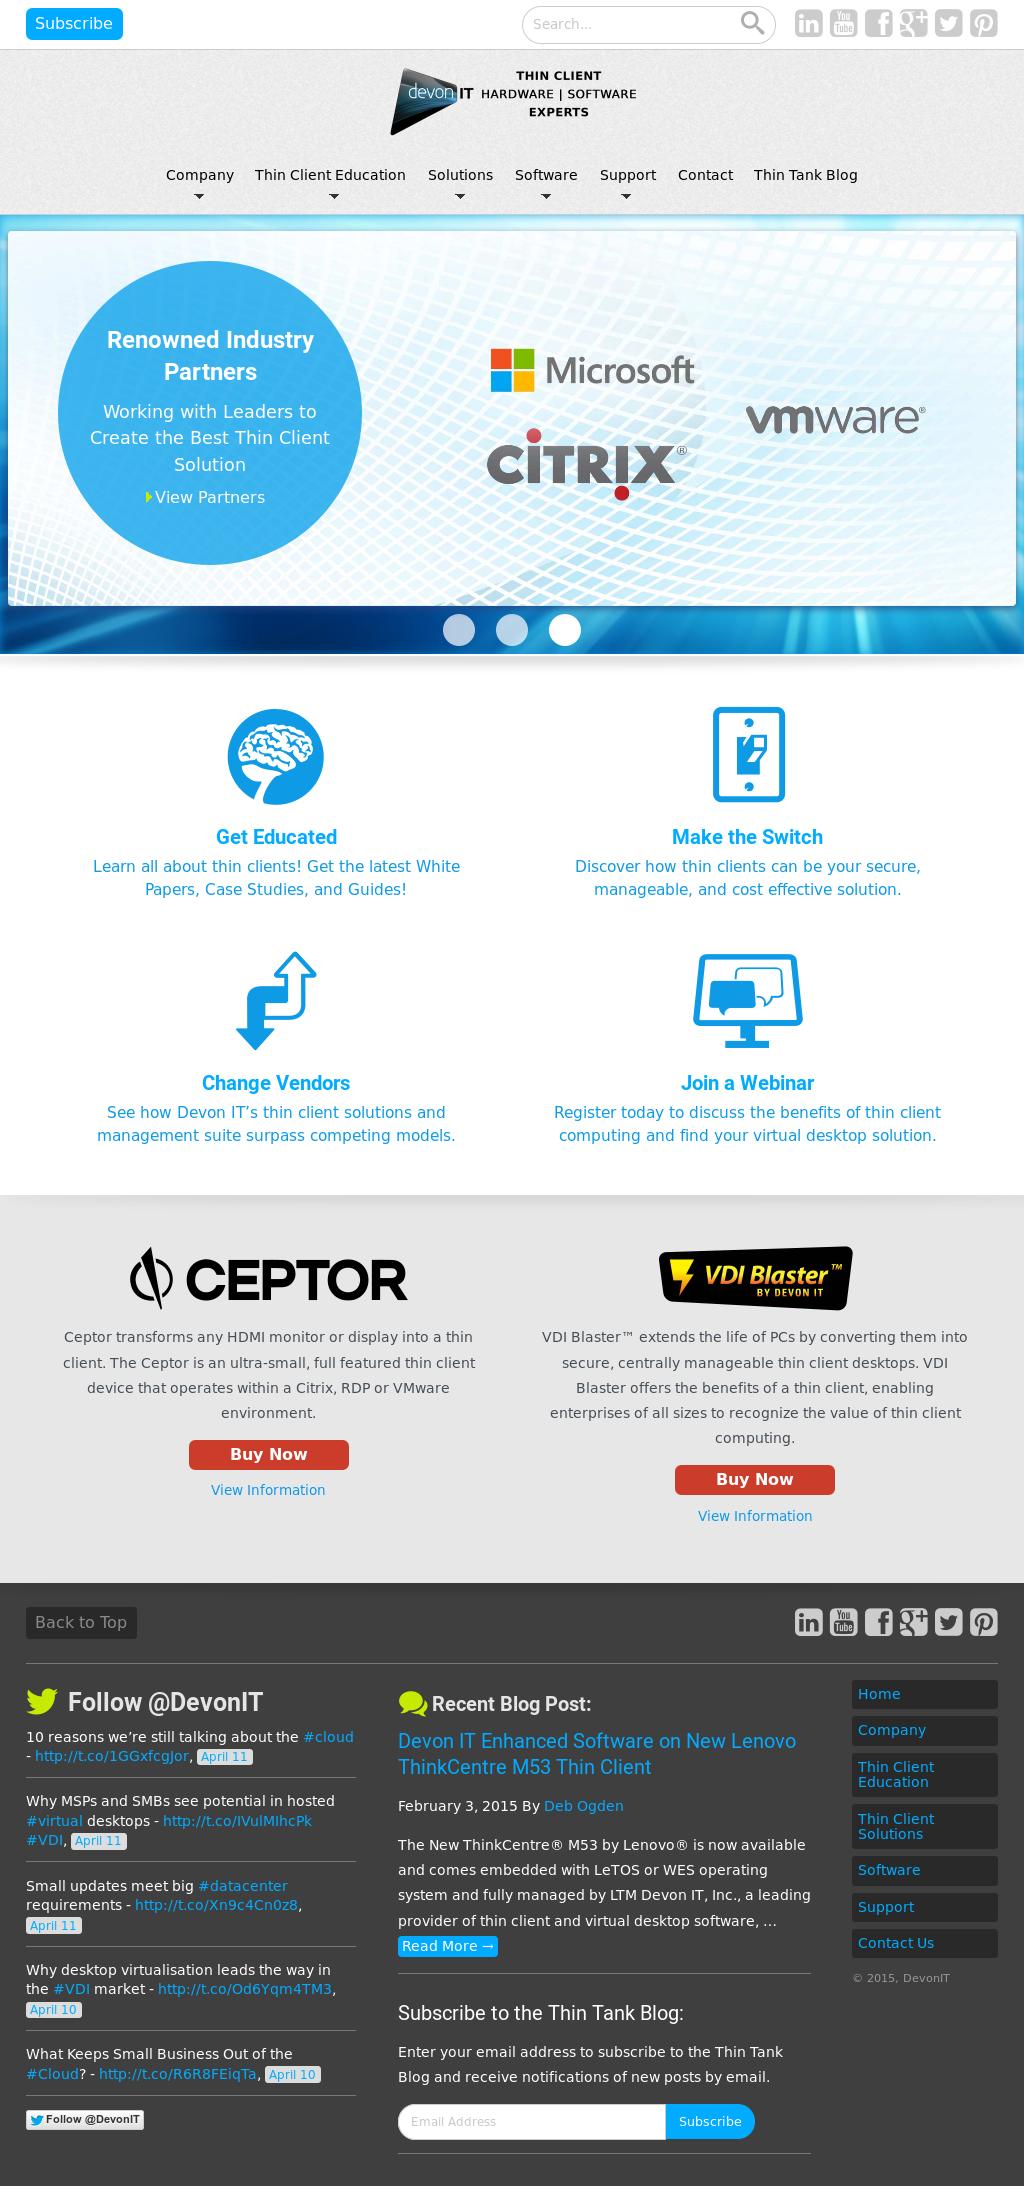 Devon IT Competitors, Revenue and Employees - Owler Company